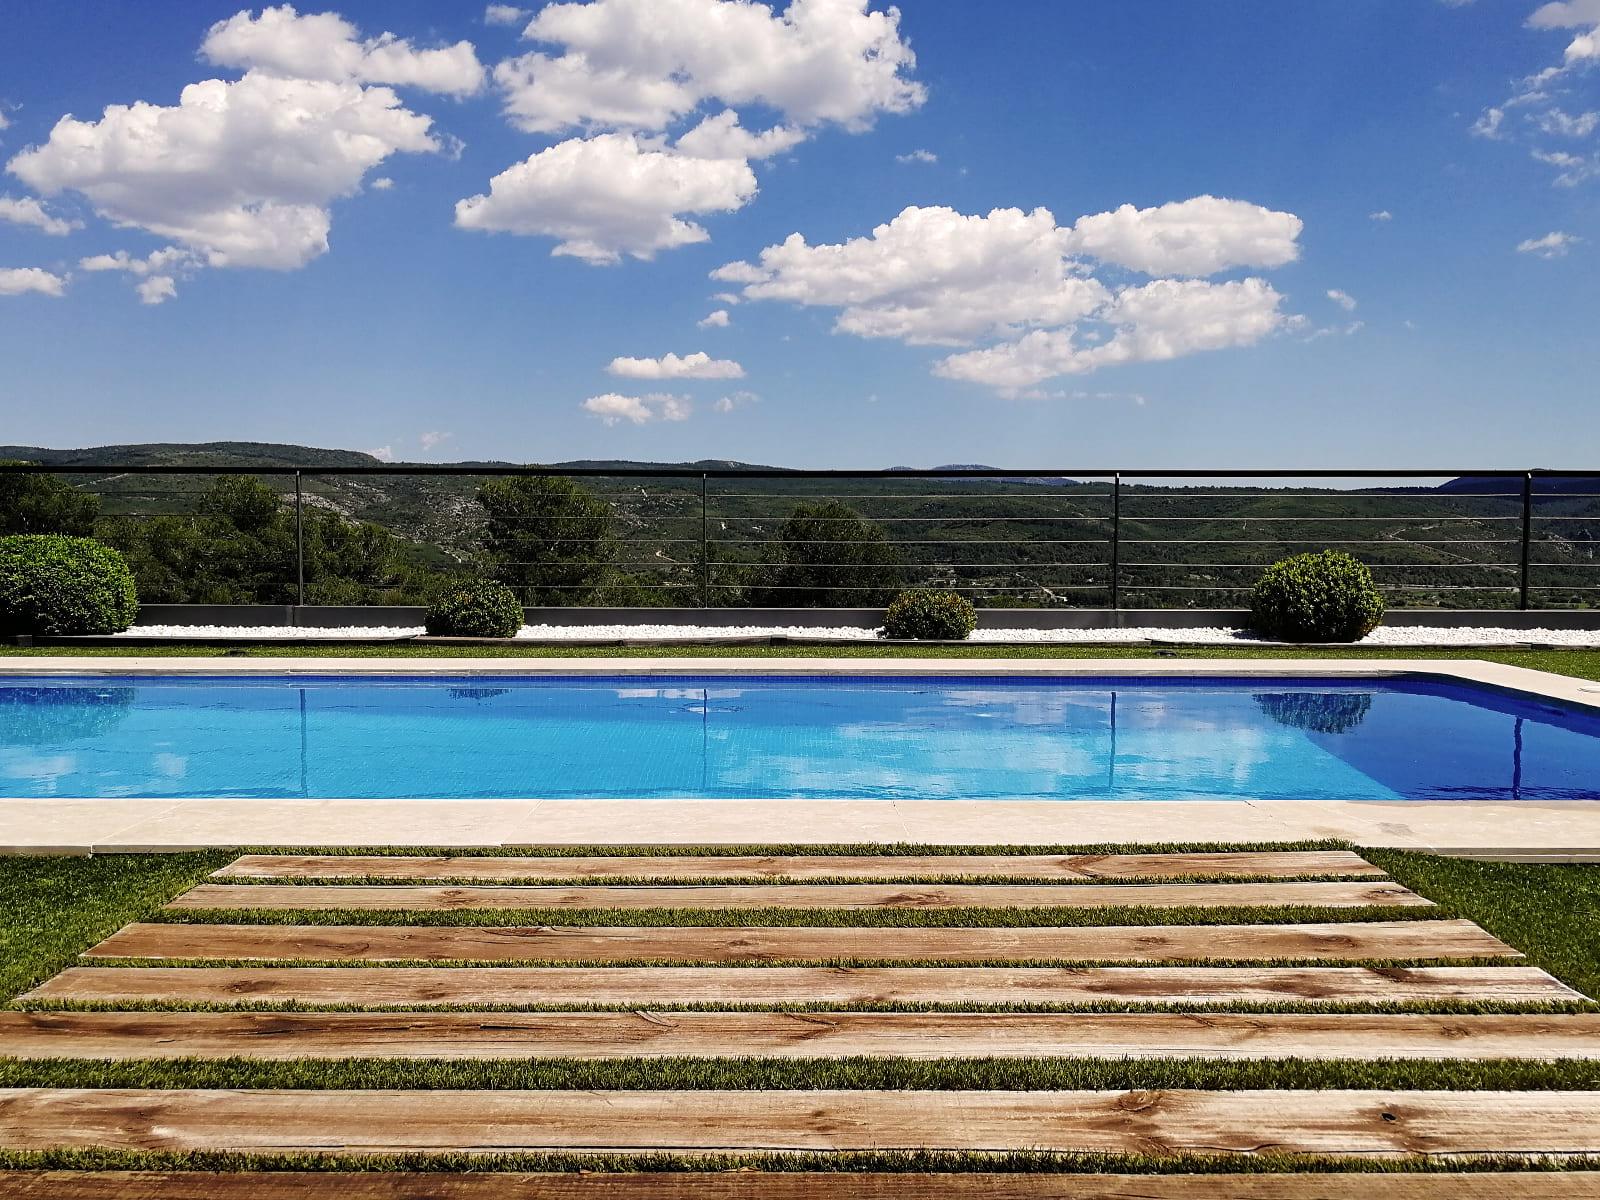 diseño-jardines-piscina-solarium-madera-IJ-12_HIDROJARDIN-Bañeres.jpg